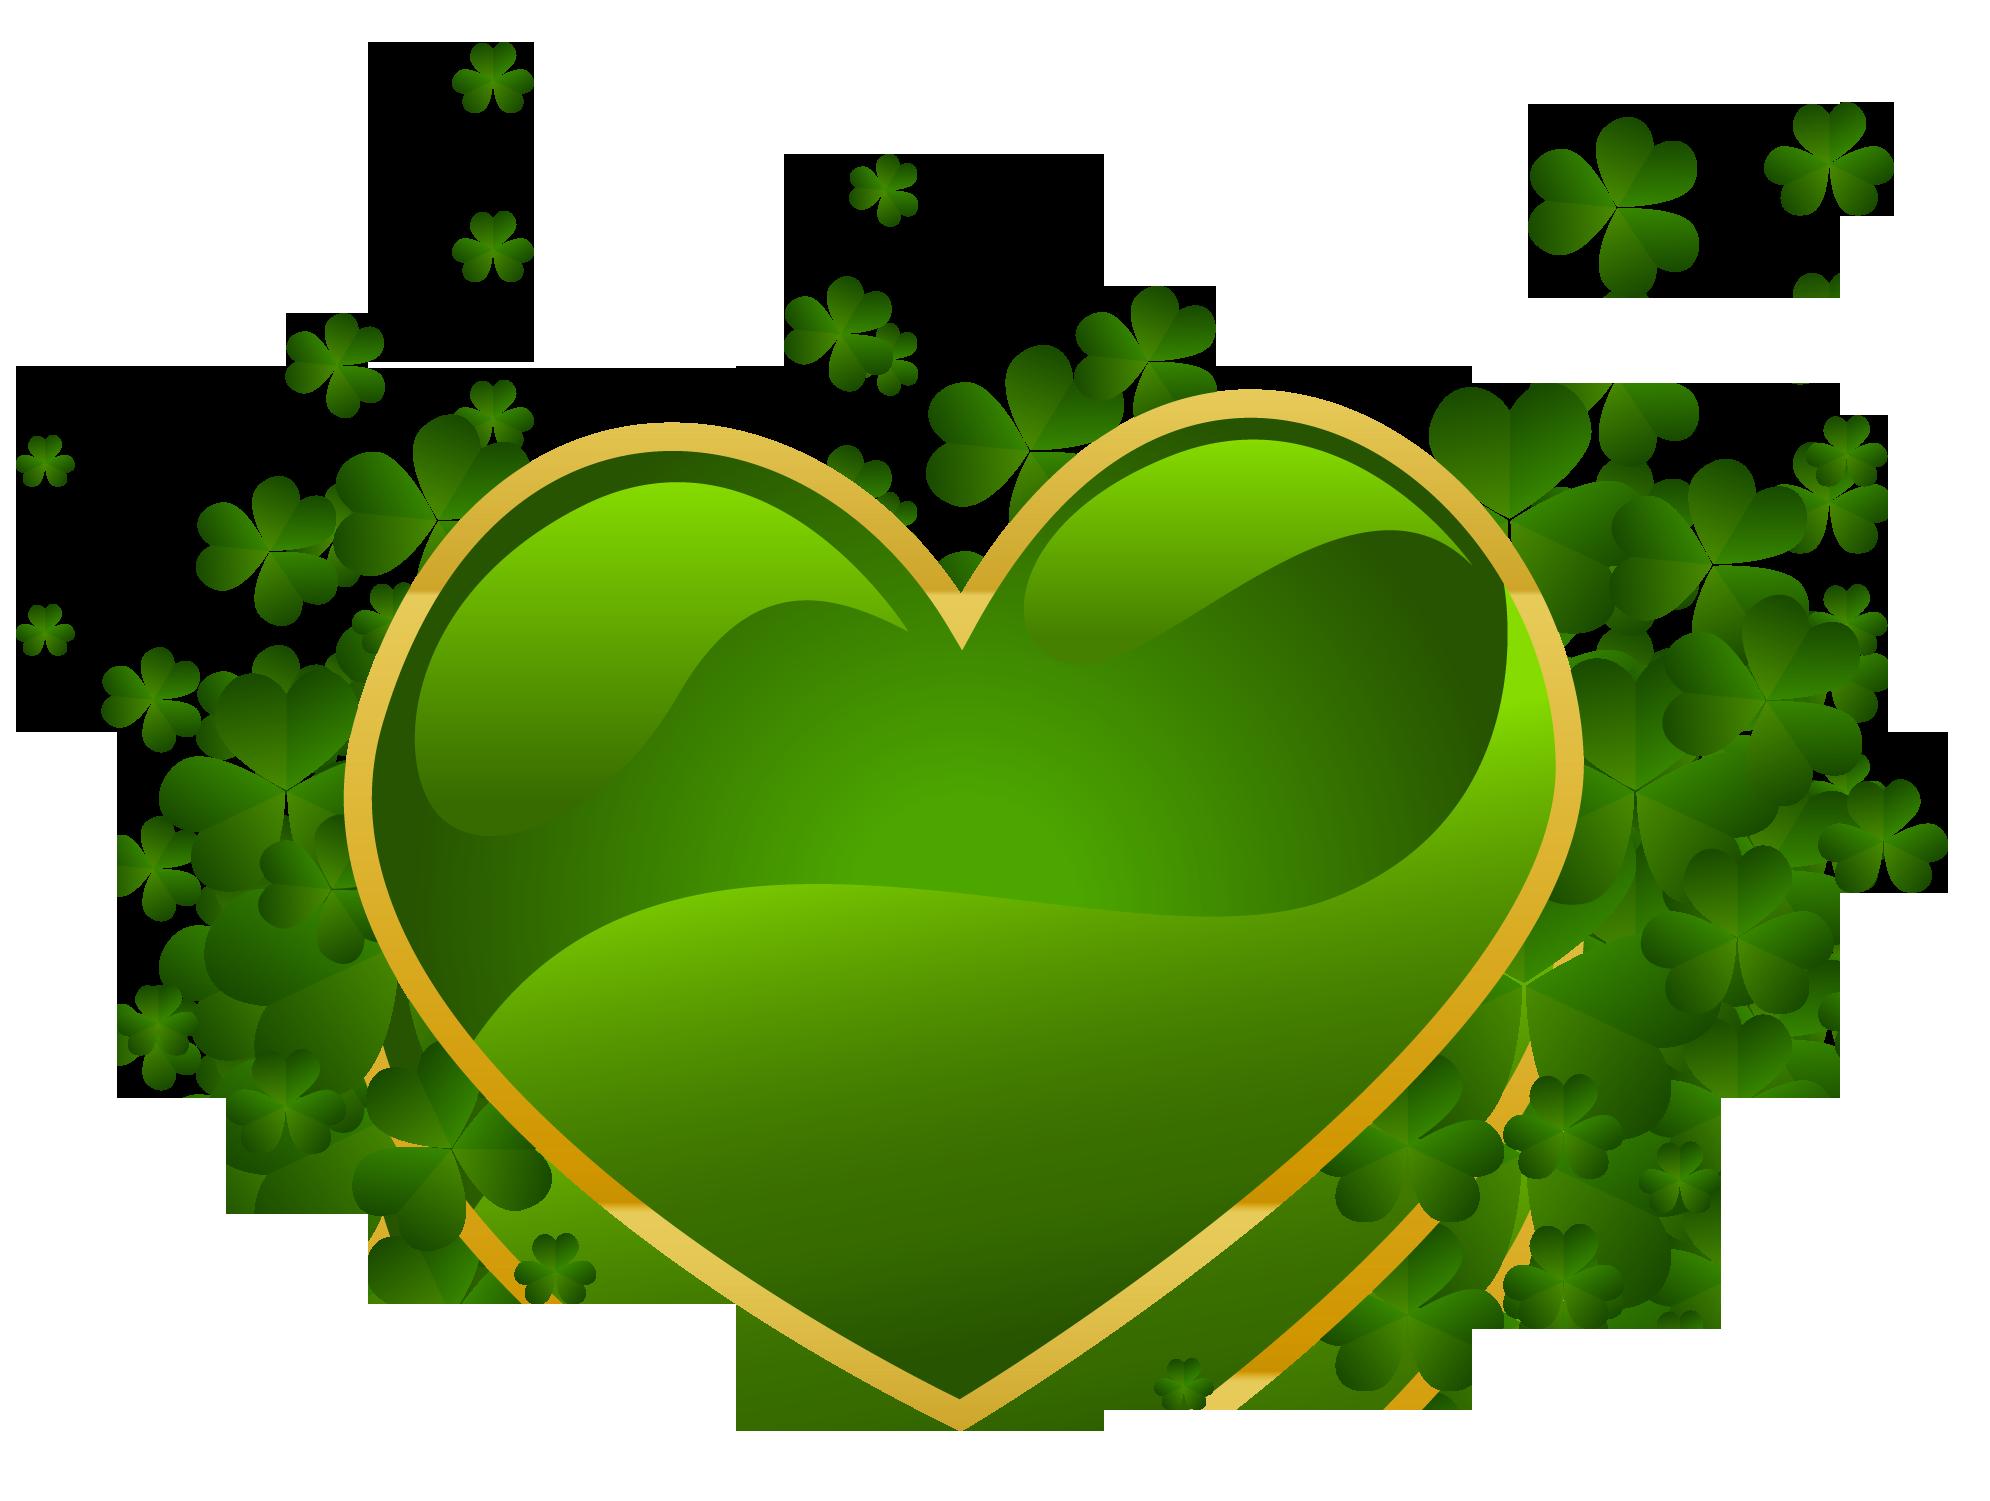 Free Shamrock Hearts Cliparts, Download Free Clip Art, Free.